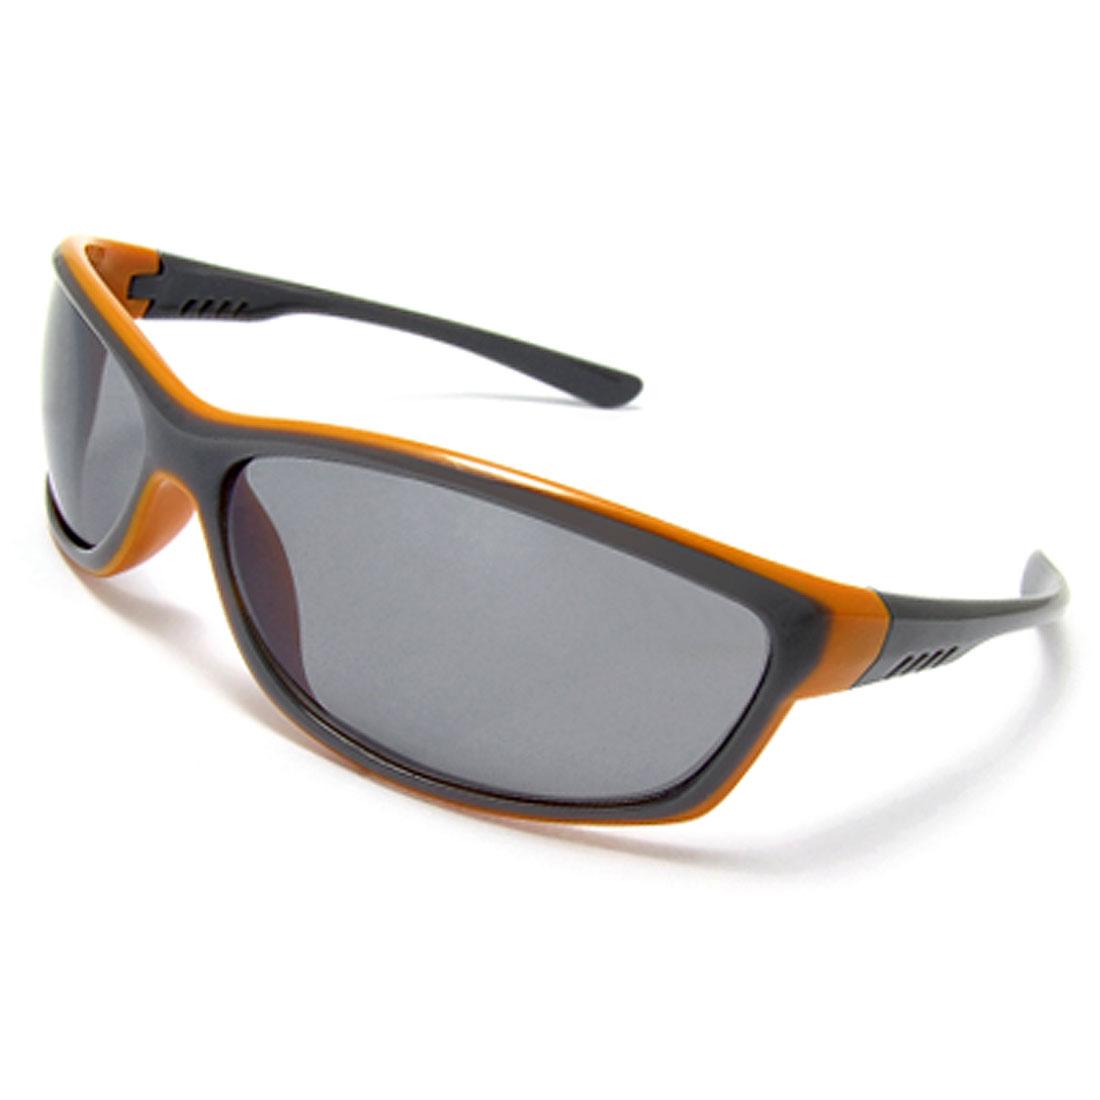 Fashion Gray Arms Plastic Frame Ladies' Sunglasses Eyewear